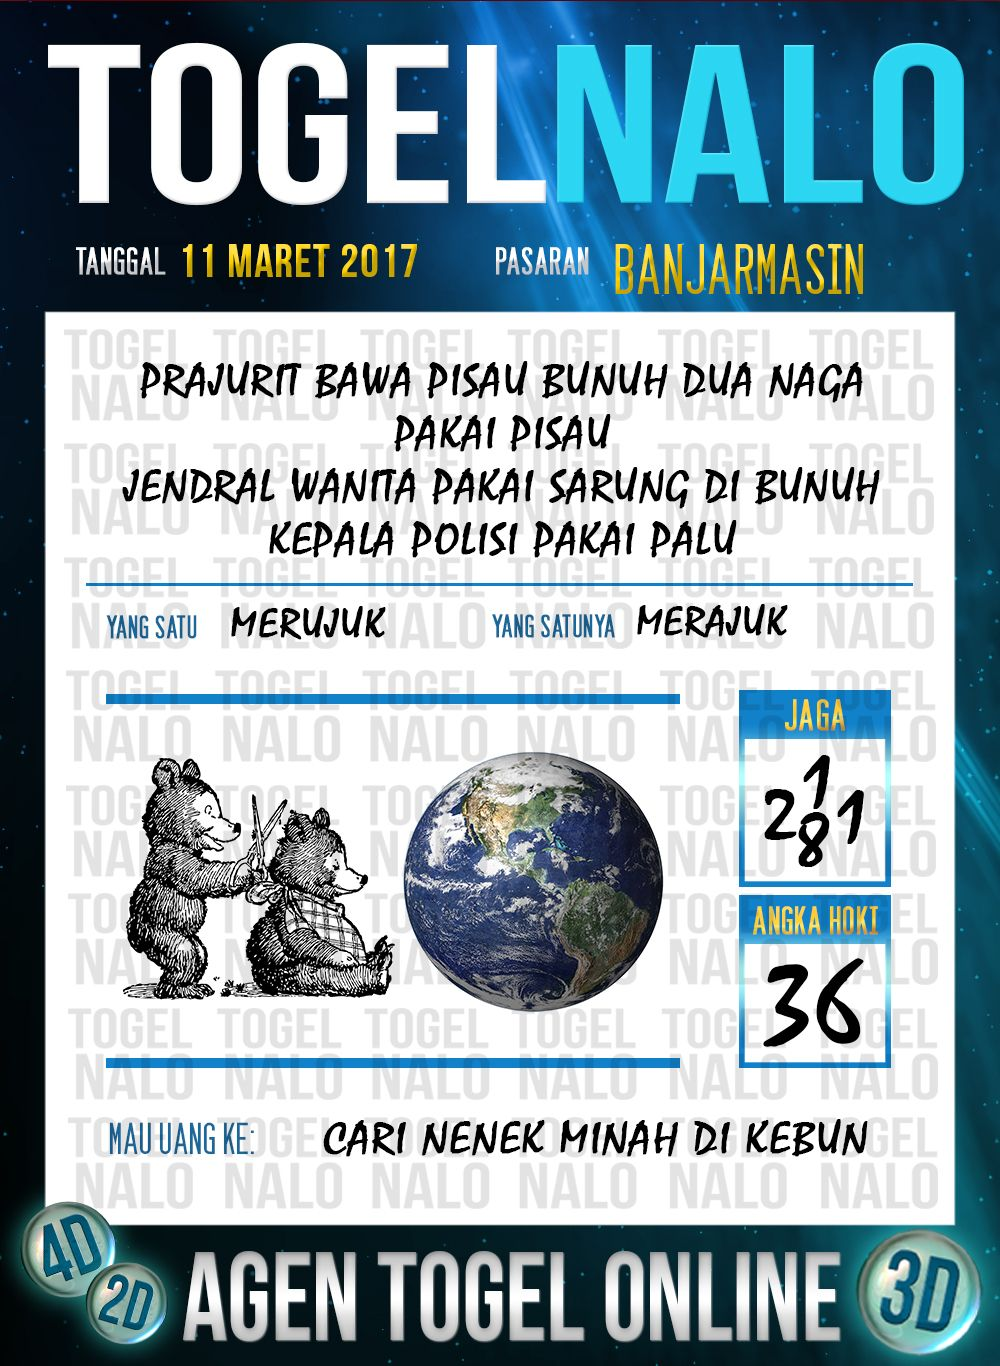 Bocoran 4D Togel Wap Online TogelNalo Banjarmasin 11 Maret